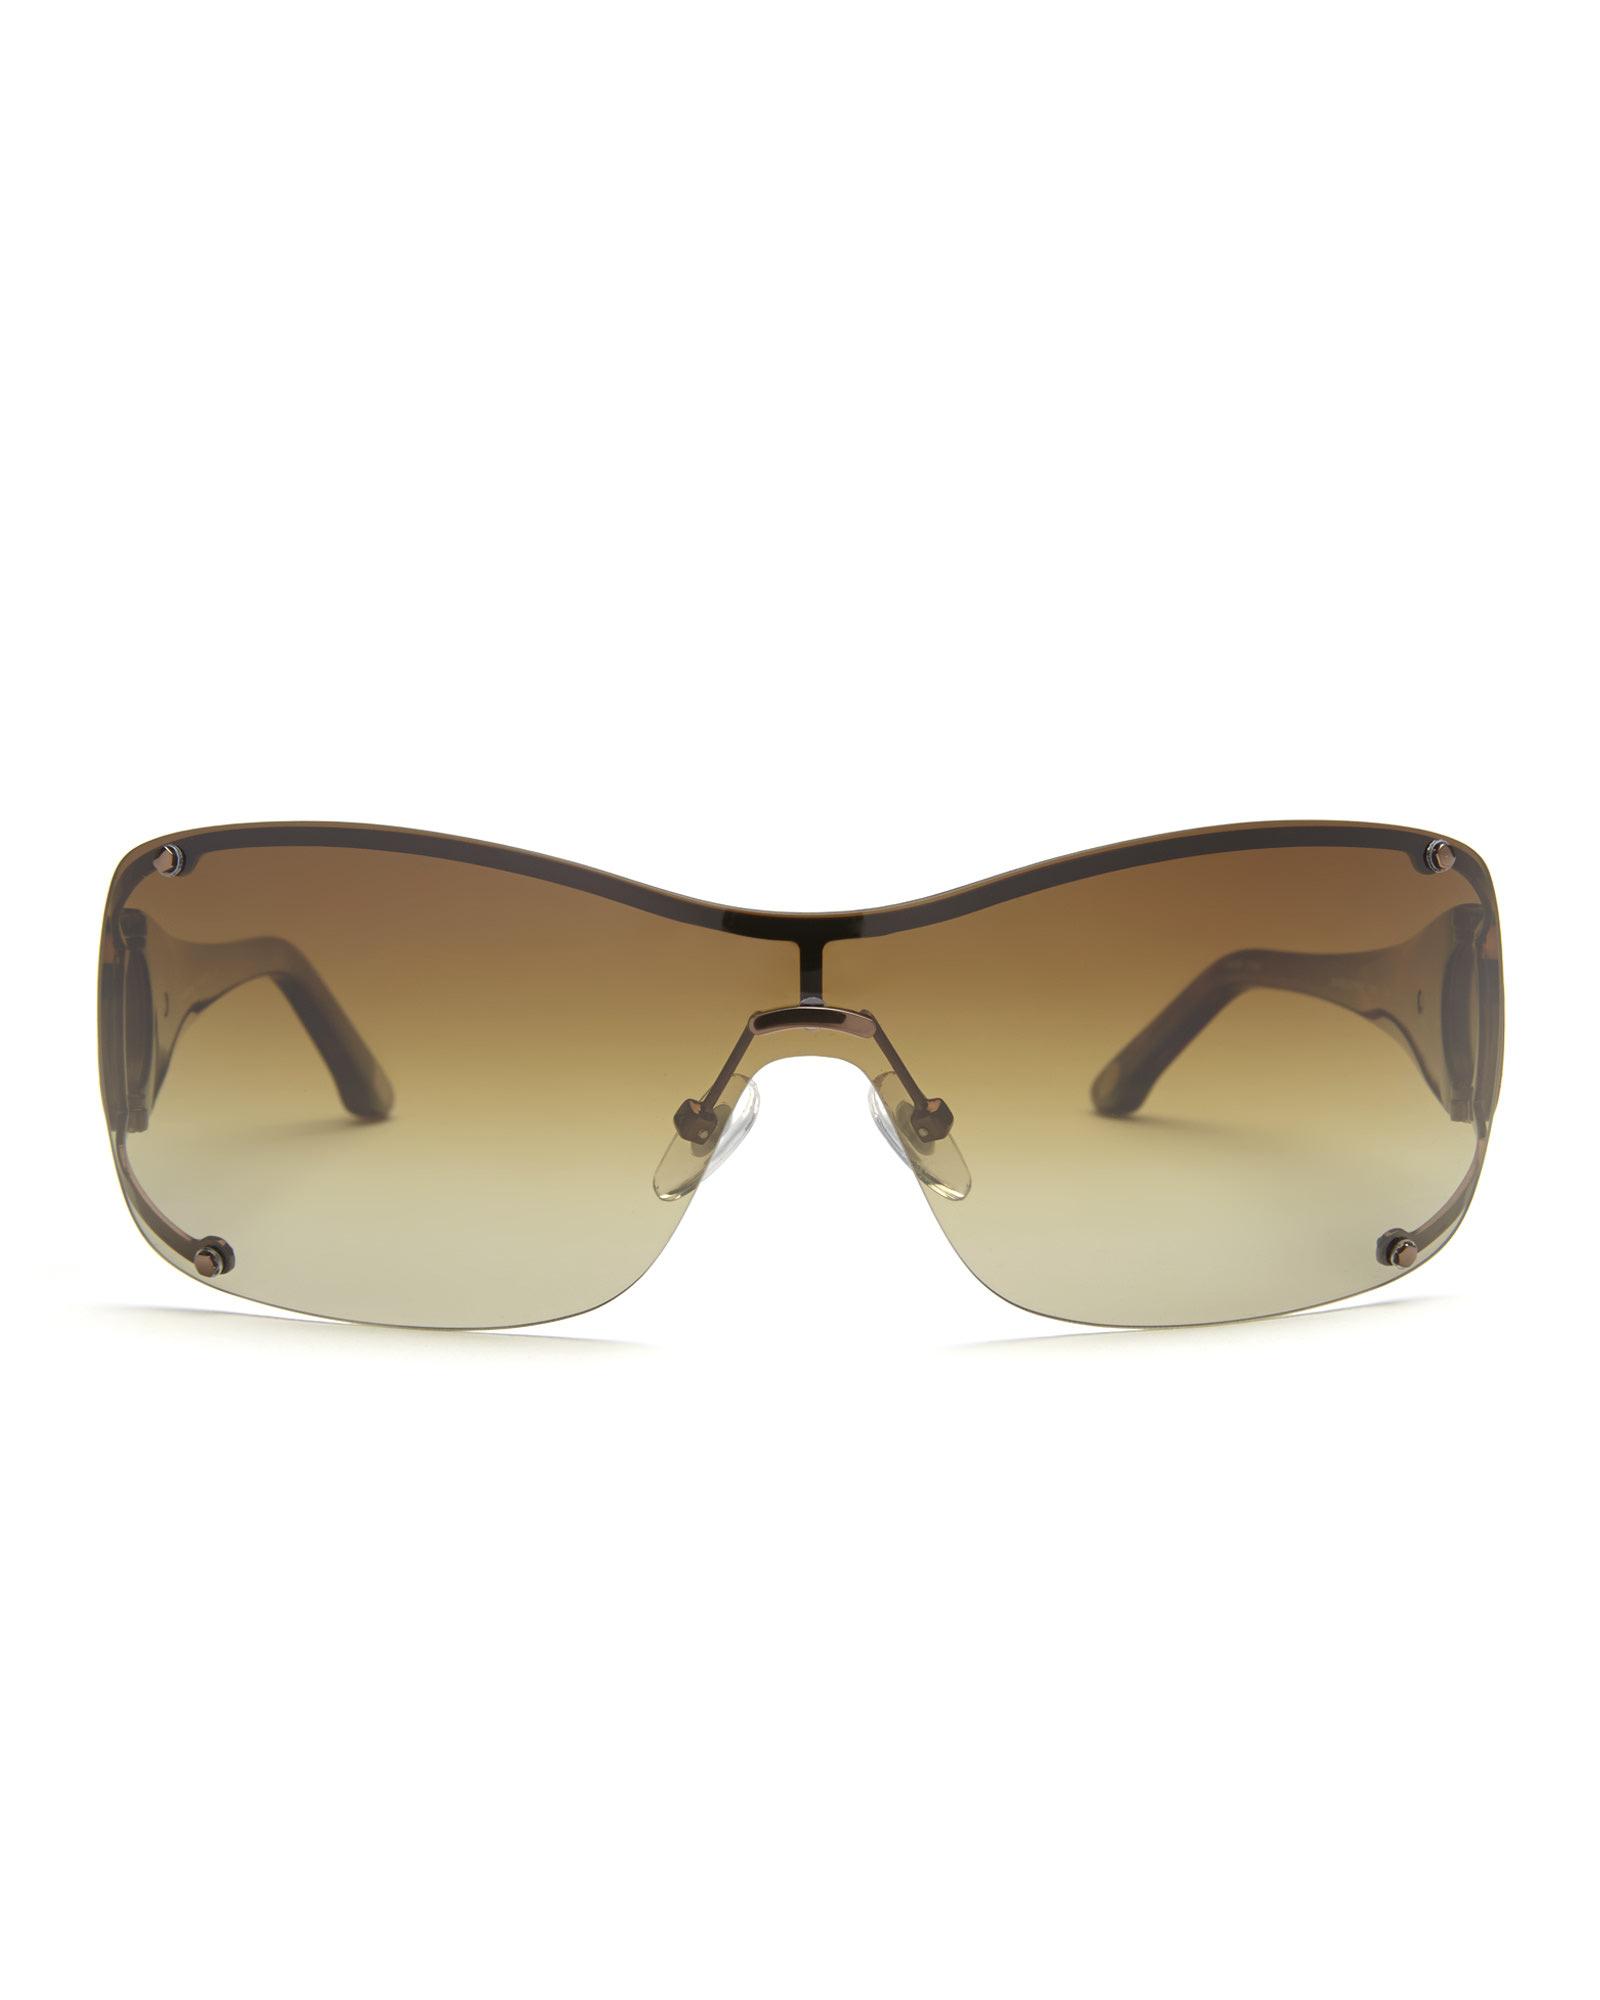 Tommy Bahama Polarized Sunglasses  tommy bahama tb7000 rimless wrap polarized sunglasses in brown lyst